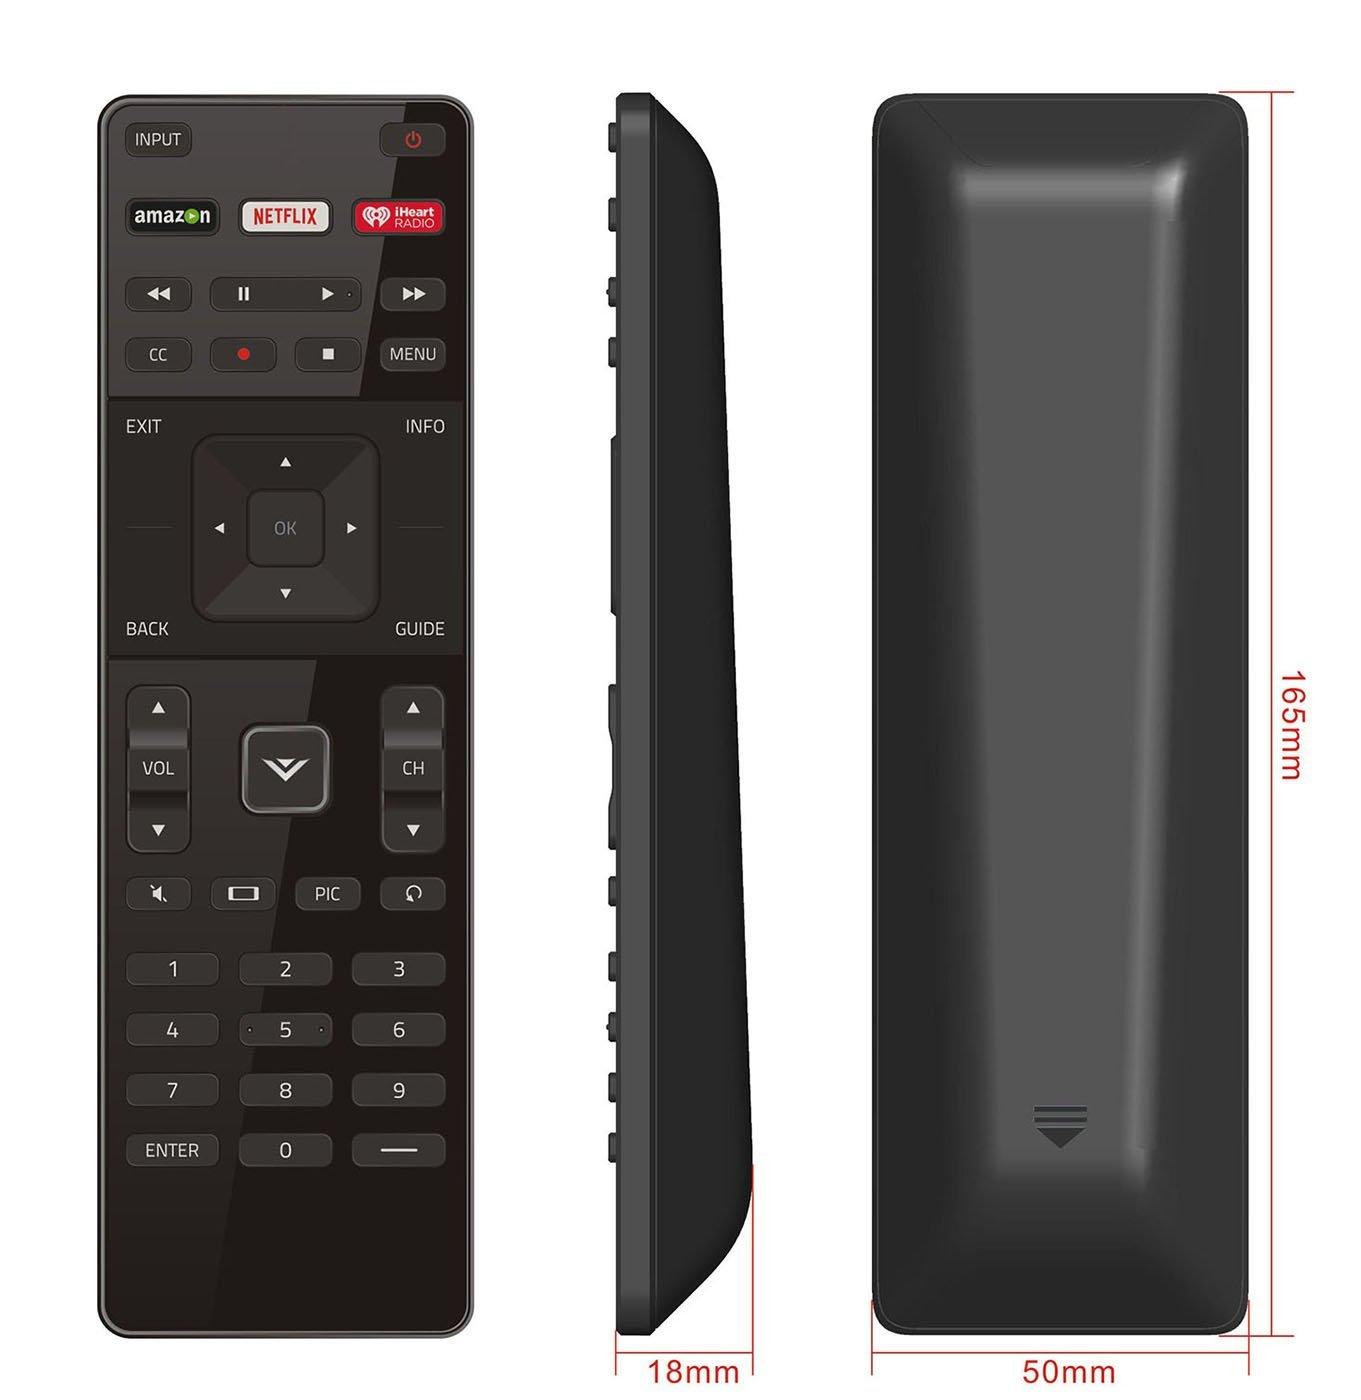 New XRT122 Remote control for Vizio LCD LED TV D39H-D0 D39HD0 D50U-D1 D50UD1 D55U-D1 D55UD1 D58U-D3 D58UD3 D65U-D2 D65UD2 E32-C1 E32C1 E32H-C1 E32HC1 E40-C2 E40C2 E40X-C2